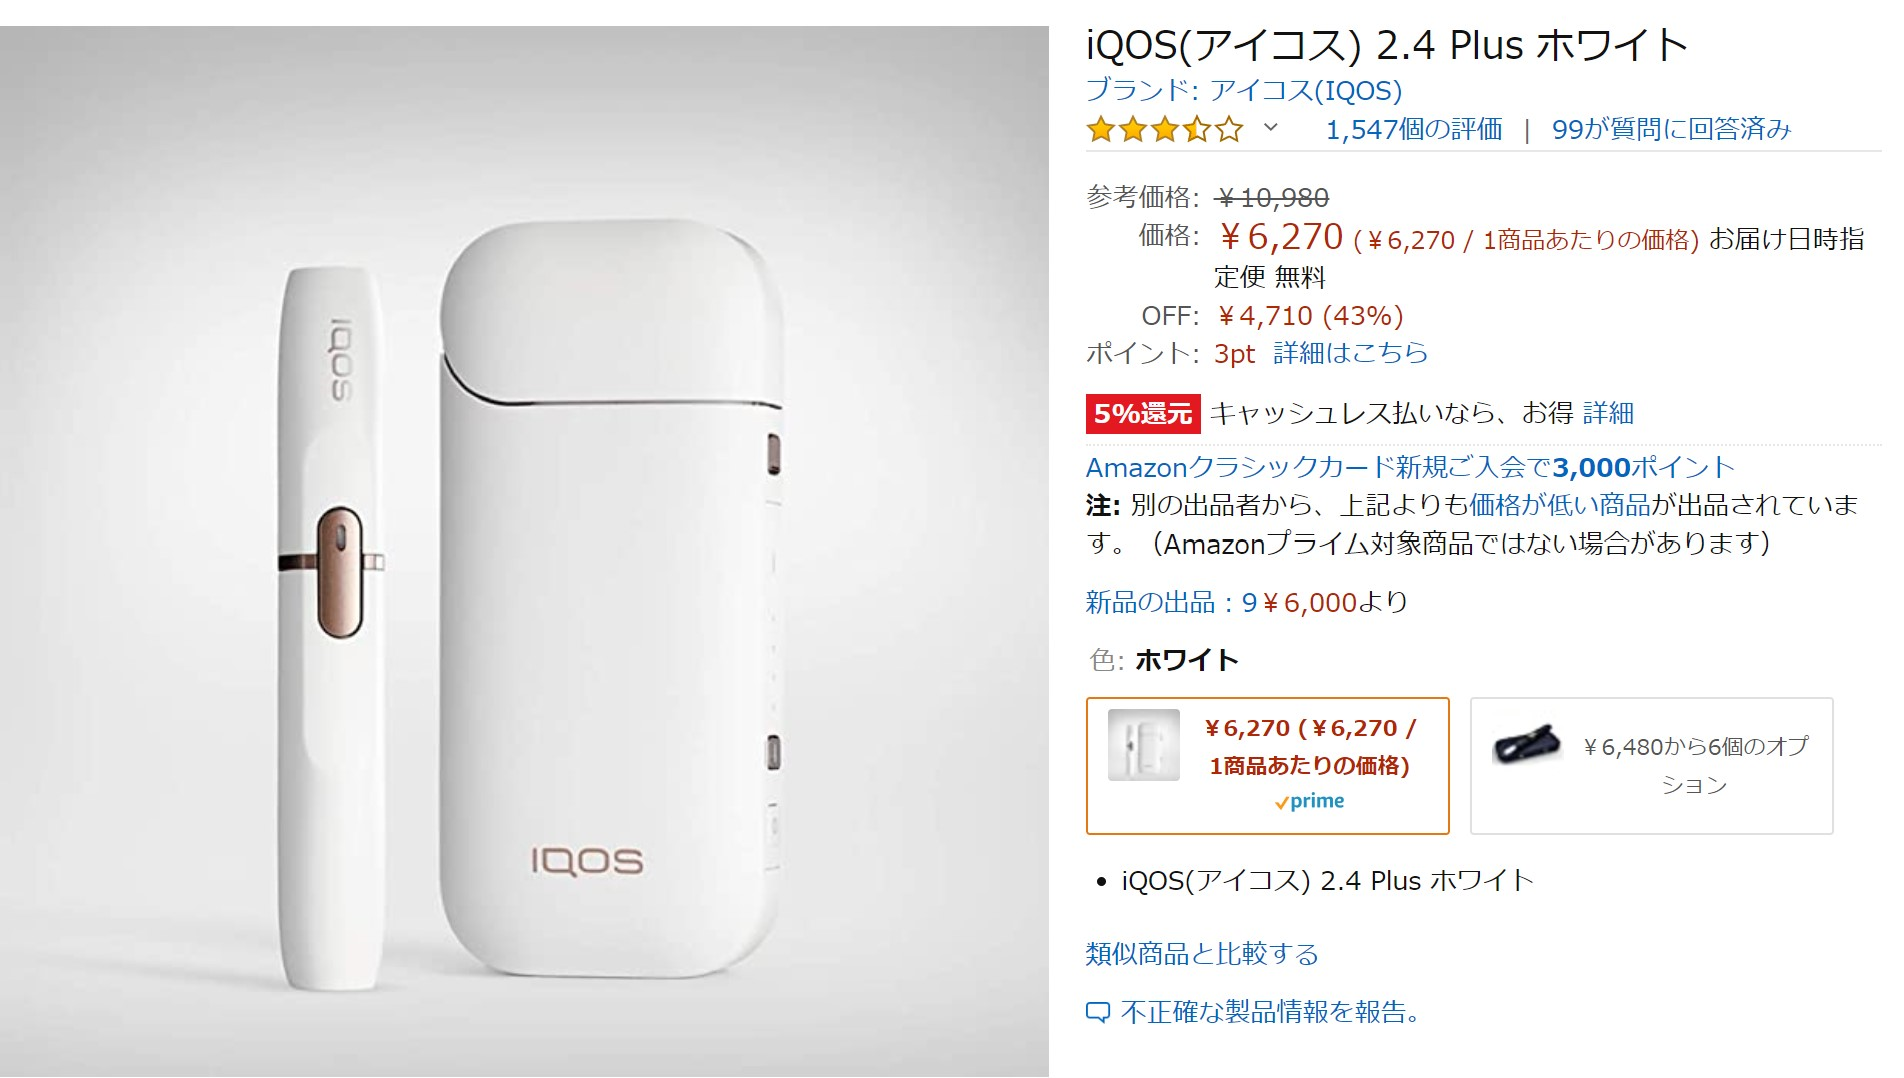 IQOSの価格相場